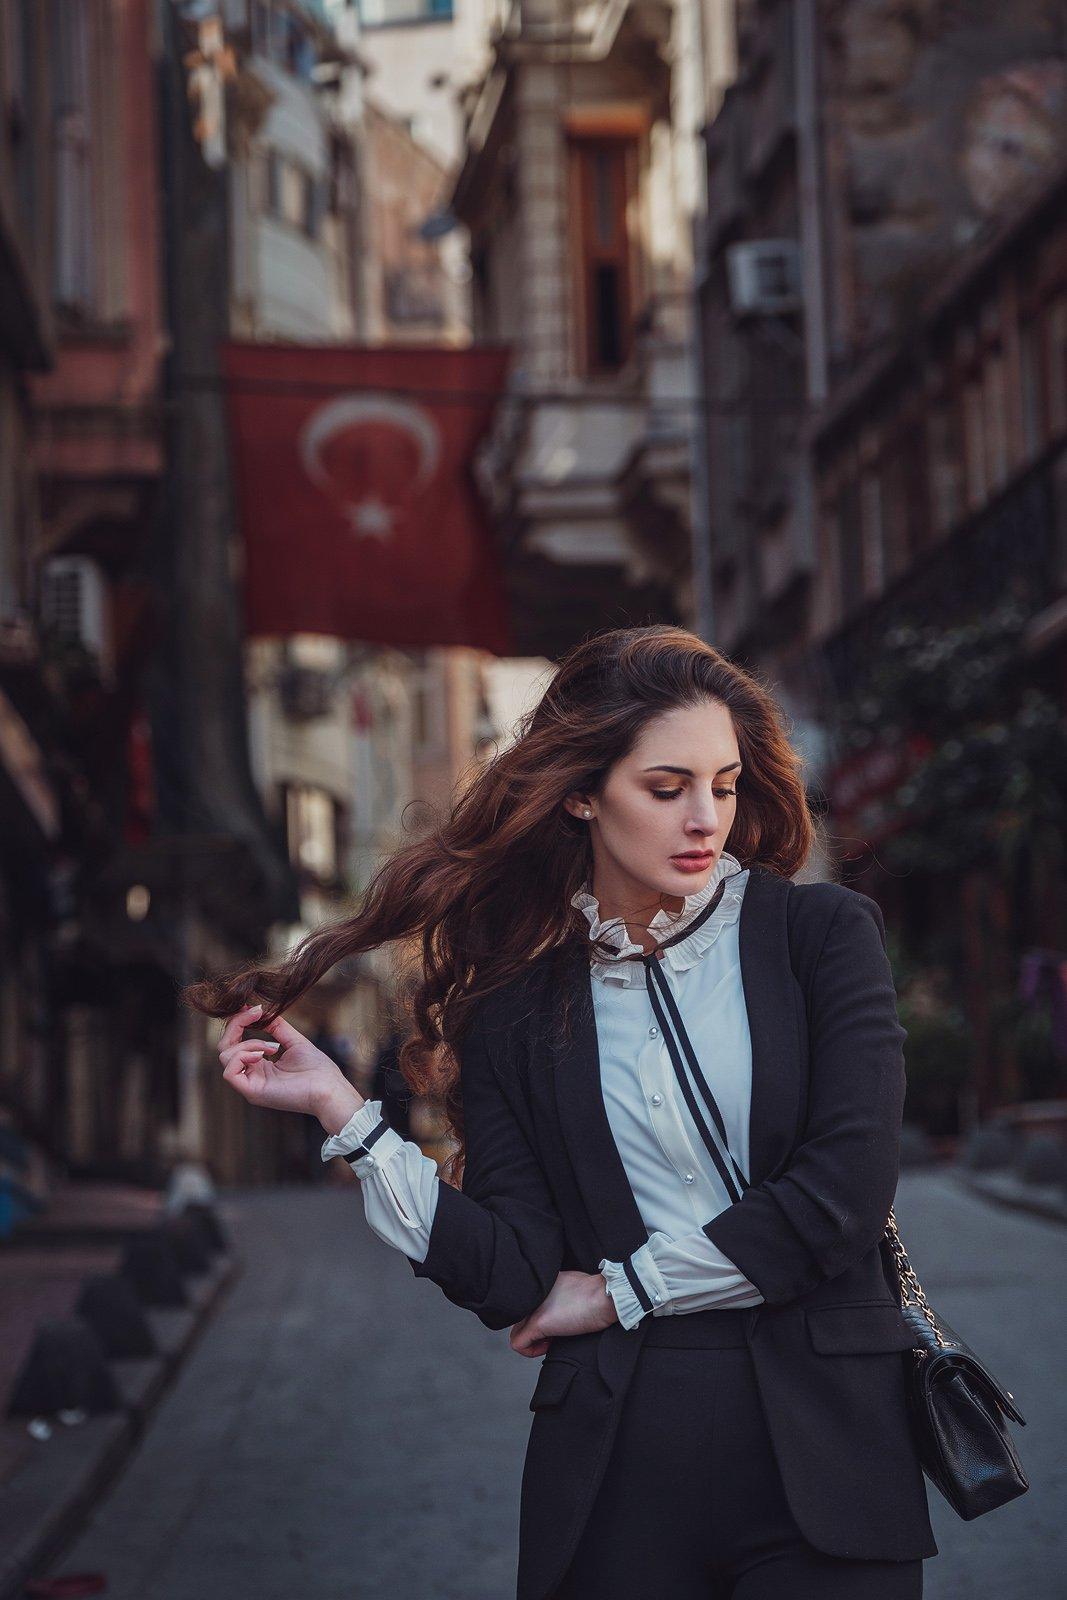 город, прогулка, девушка, весна, счастье, Стамбул, , брюнетка, city, town, walk, woman, Елена Молчанова